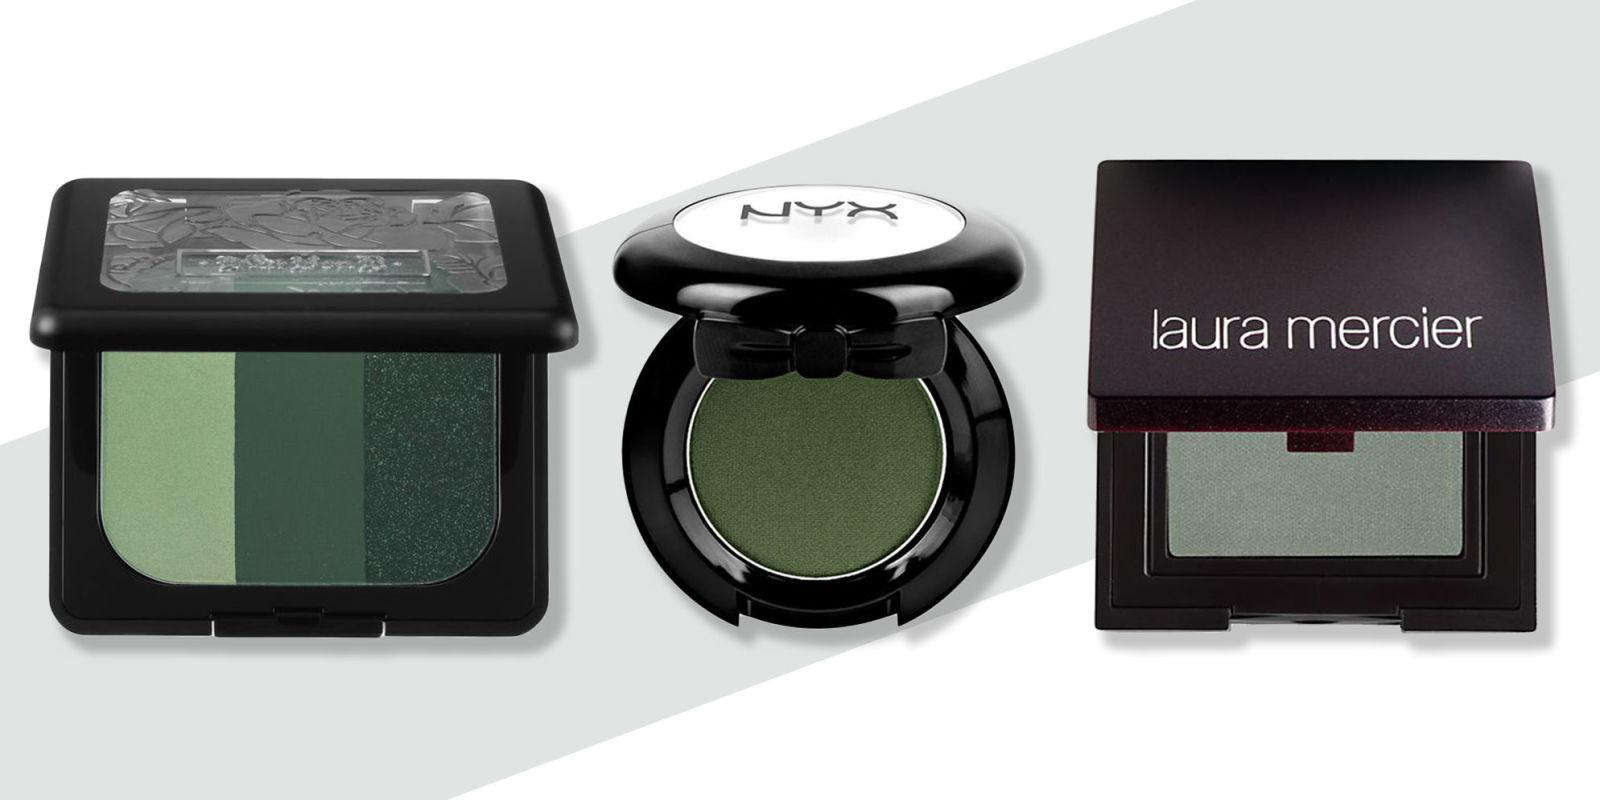 Teal Green Bathroom Accessories